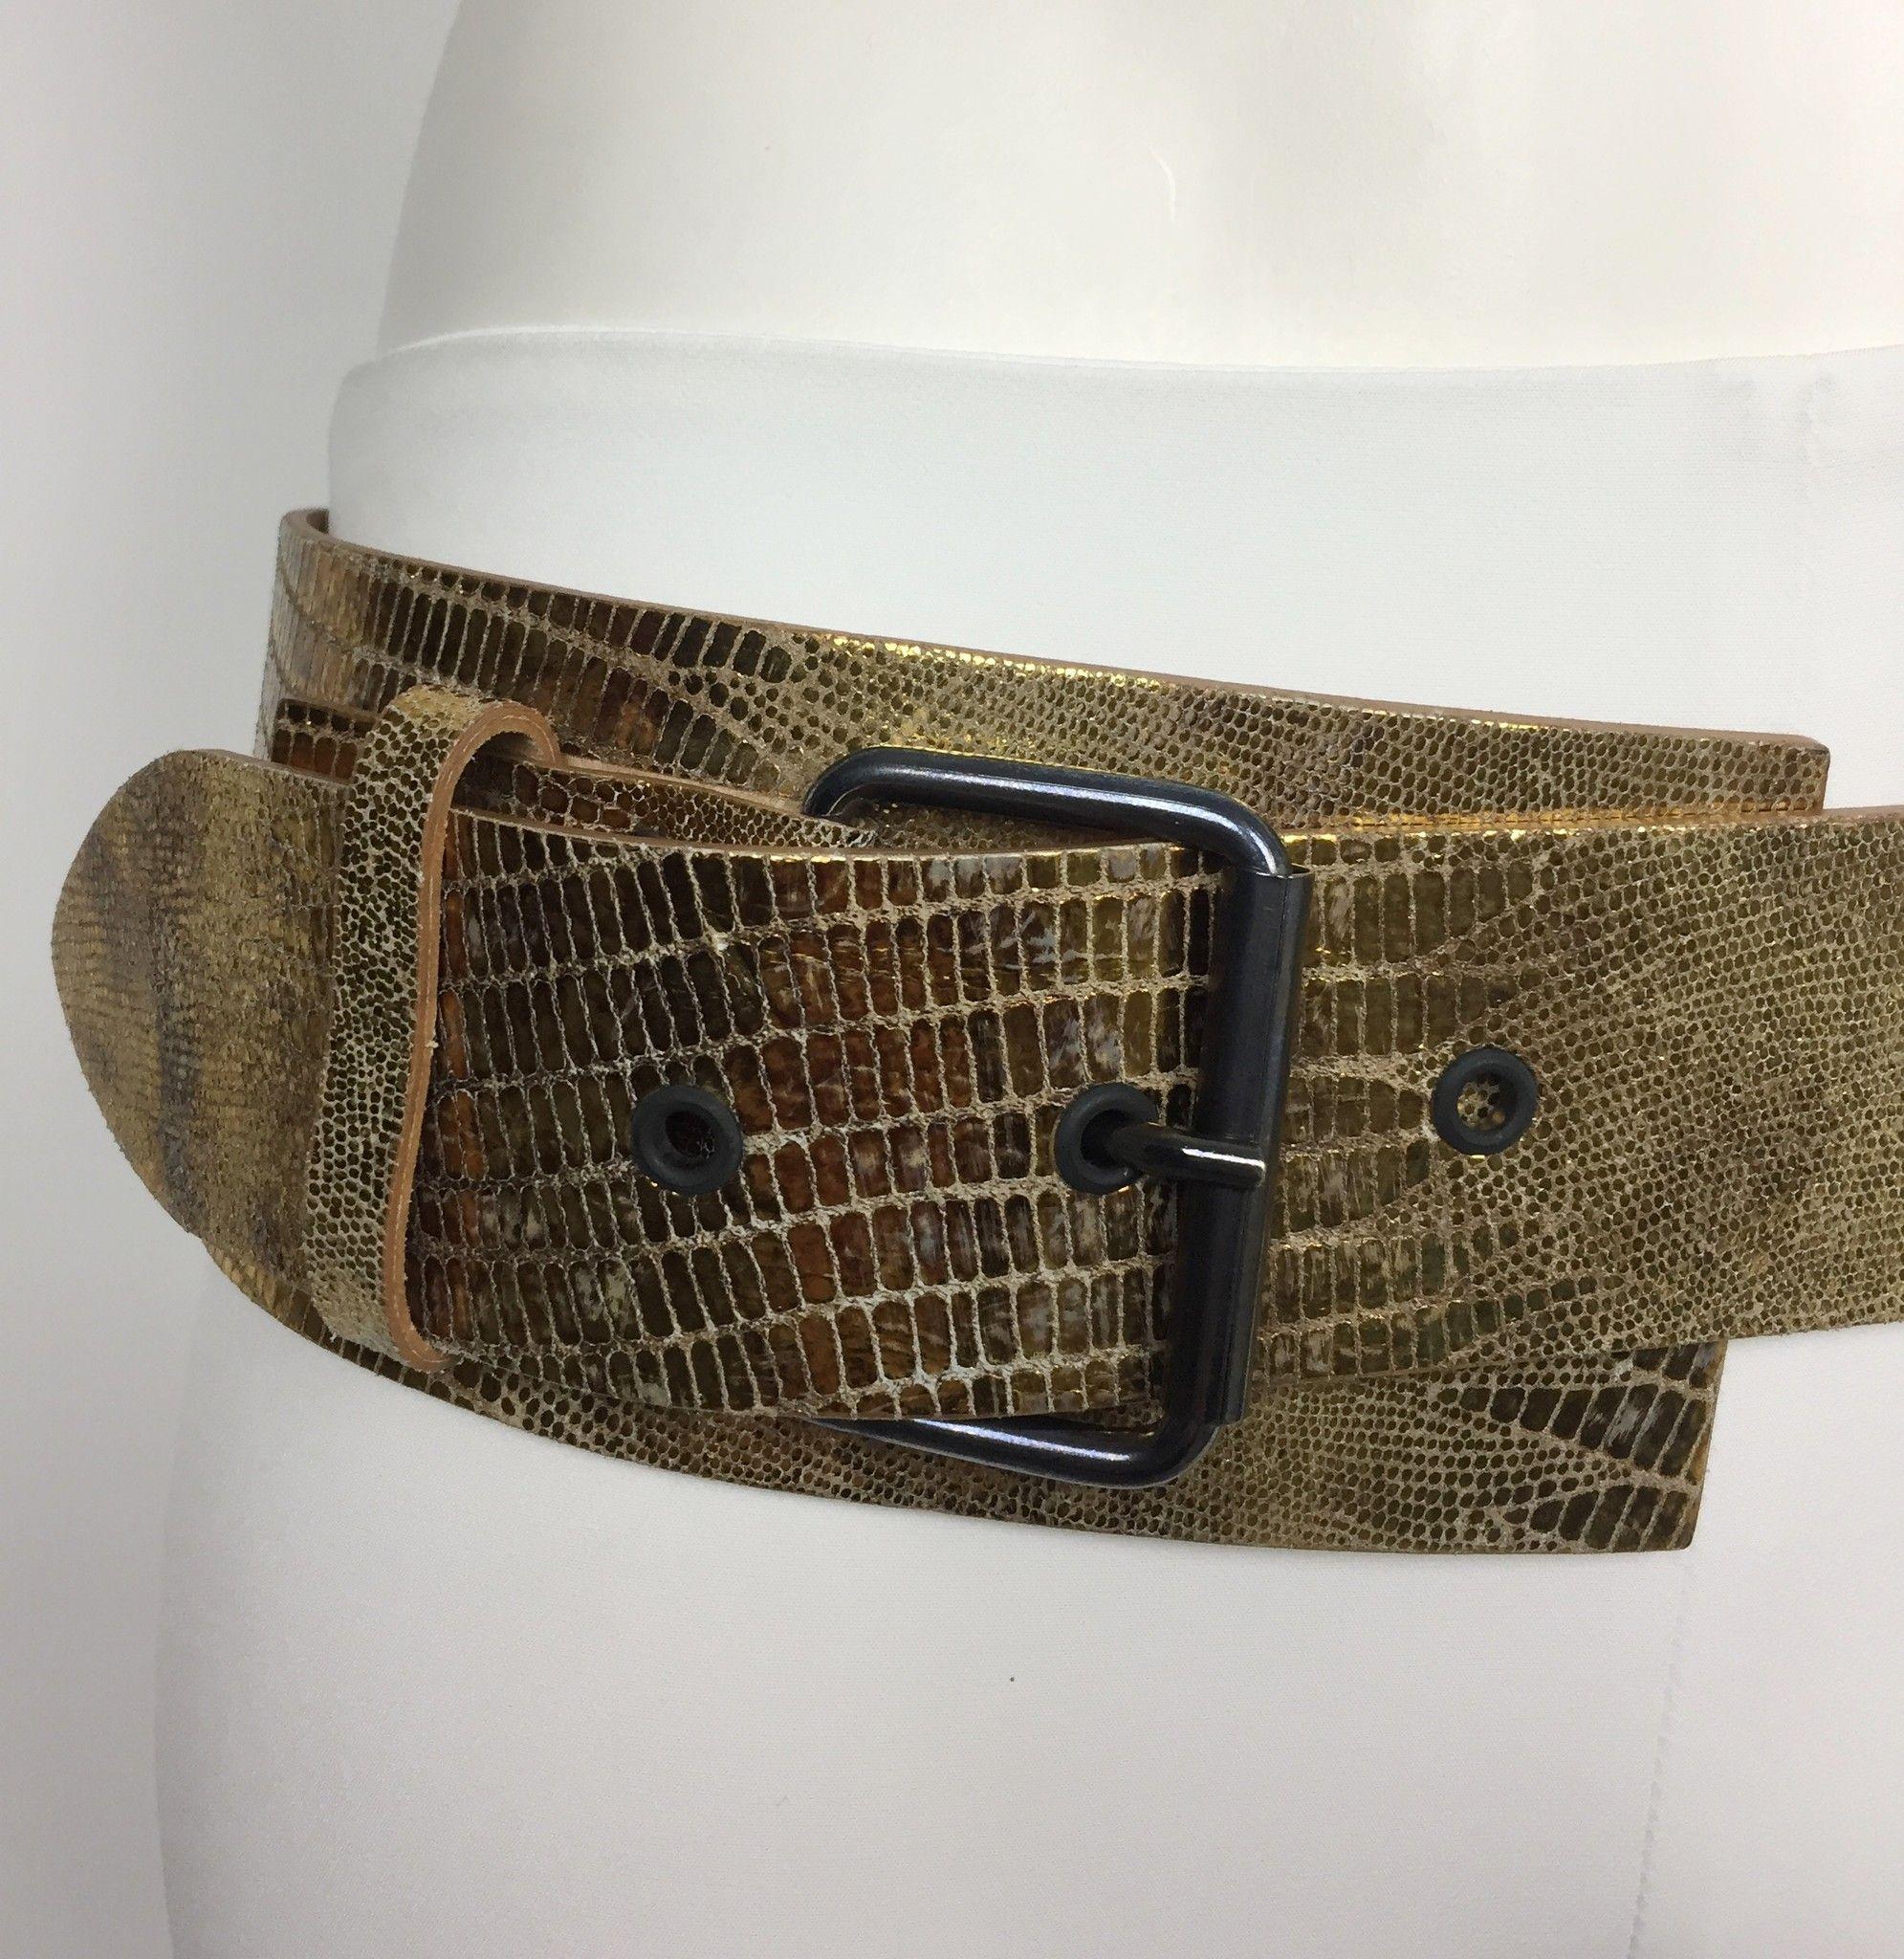 Cintura Adele Fado Alta Stampata Cod.9746513